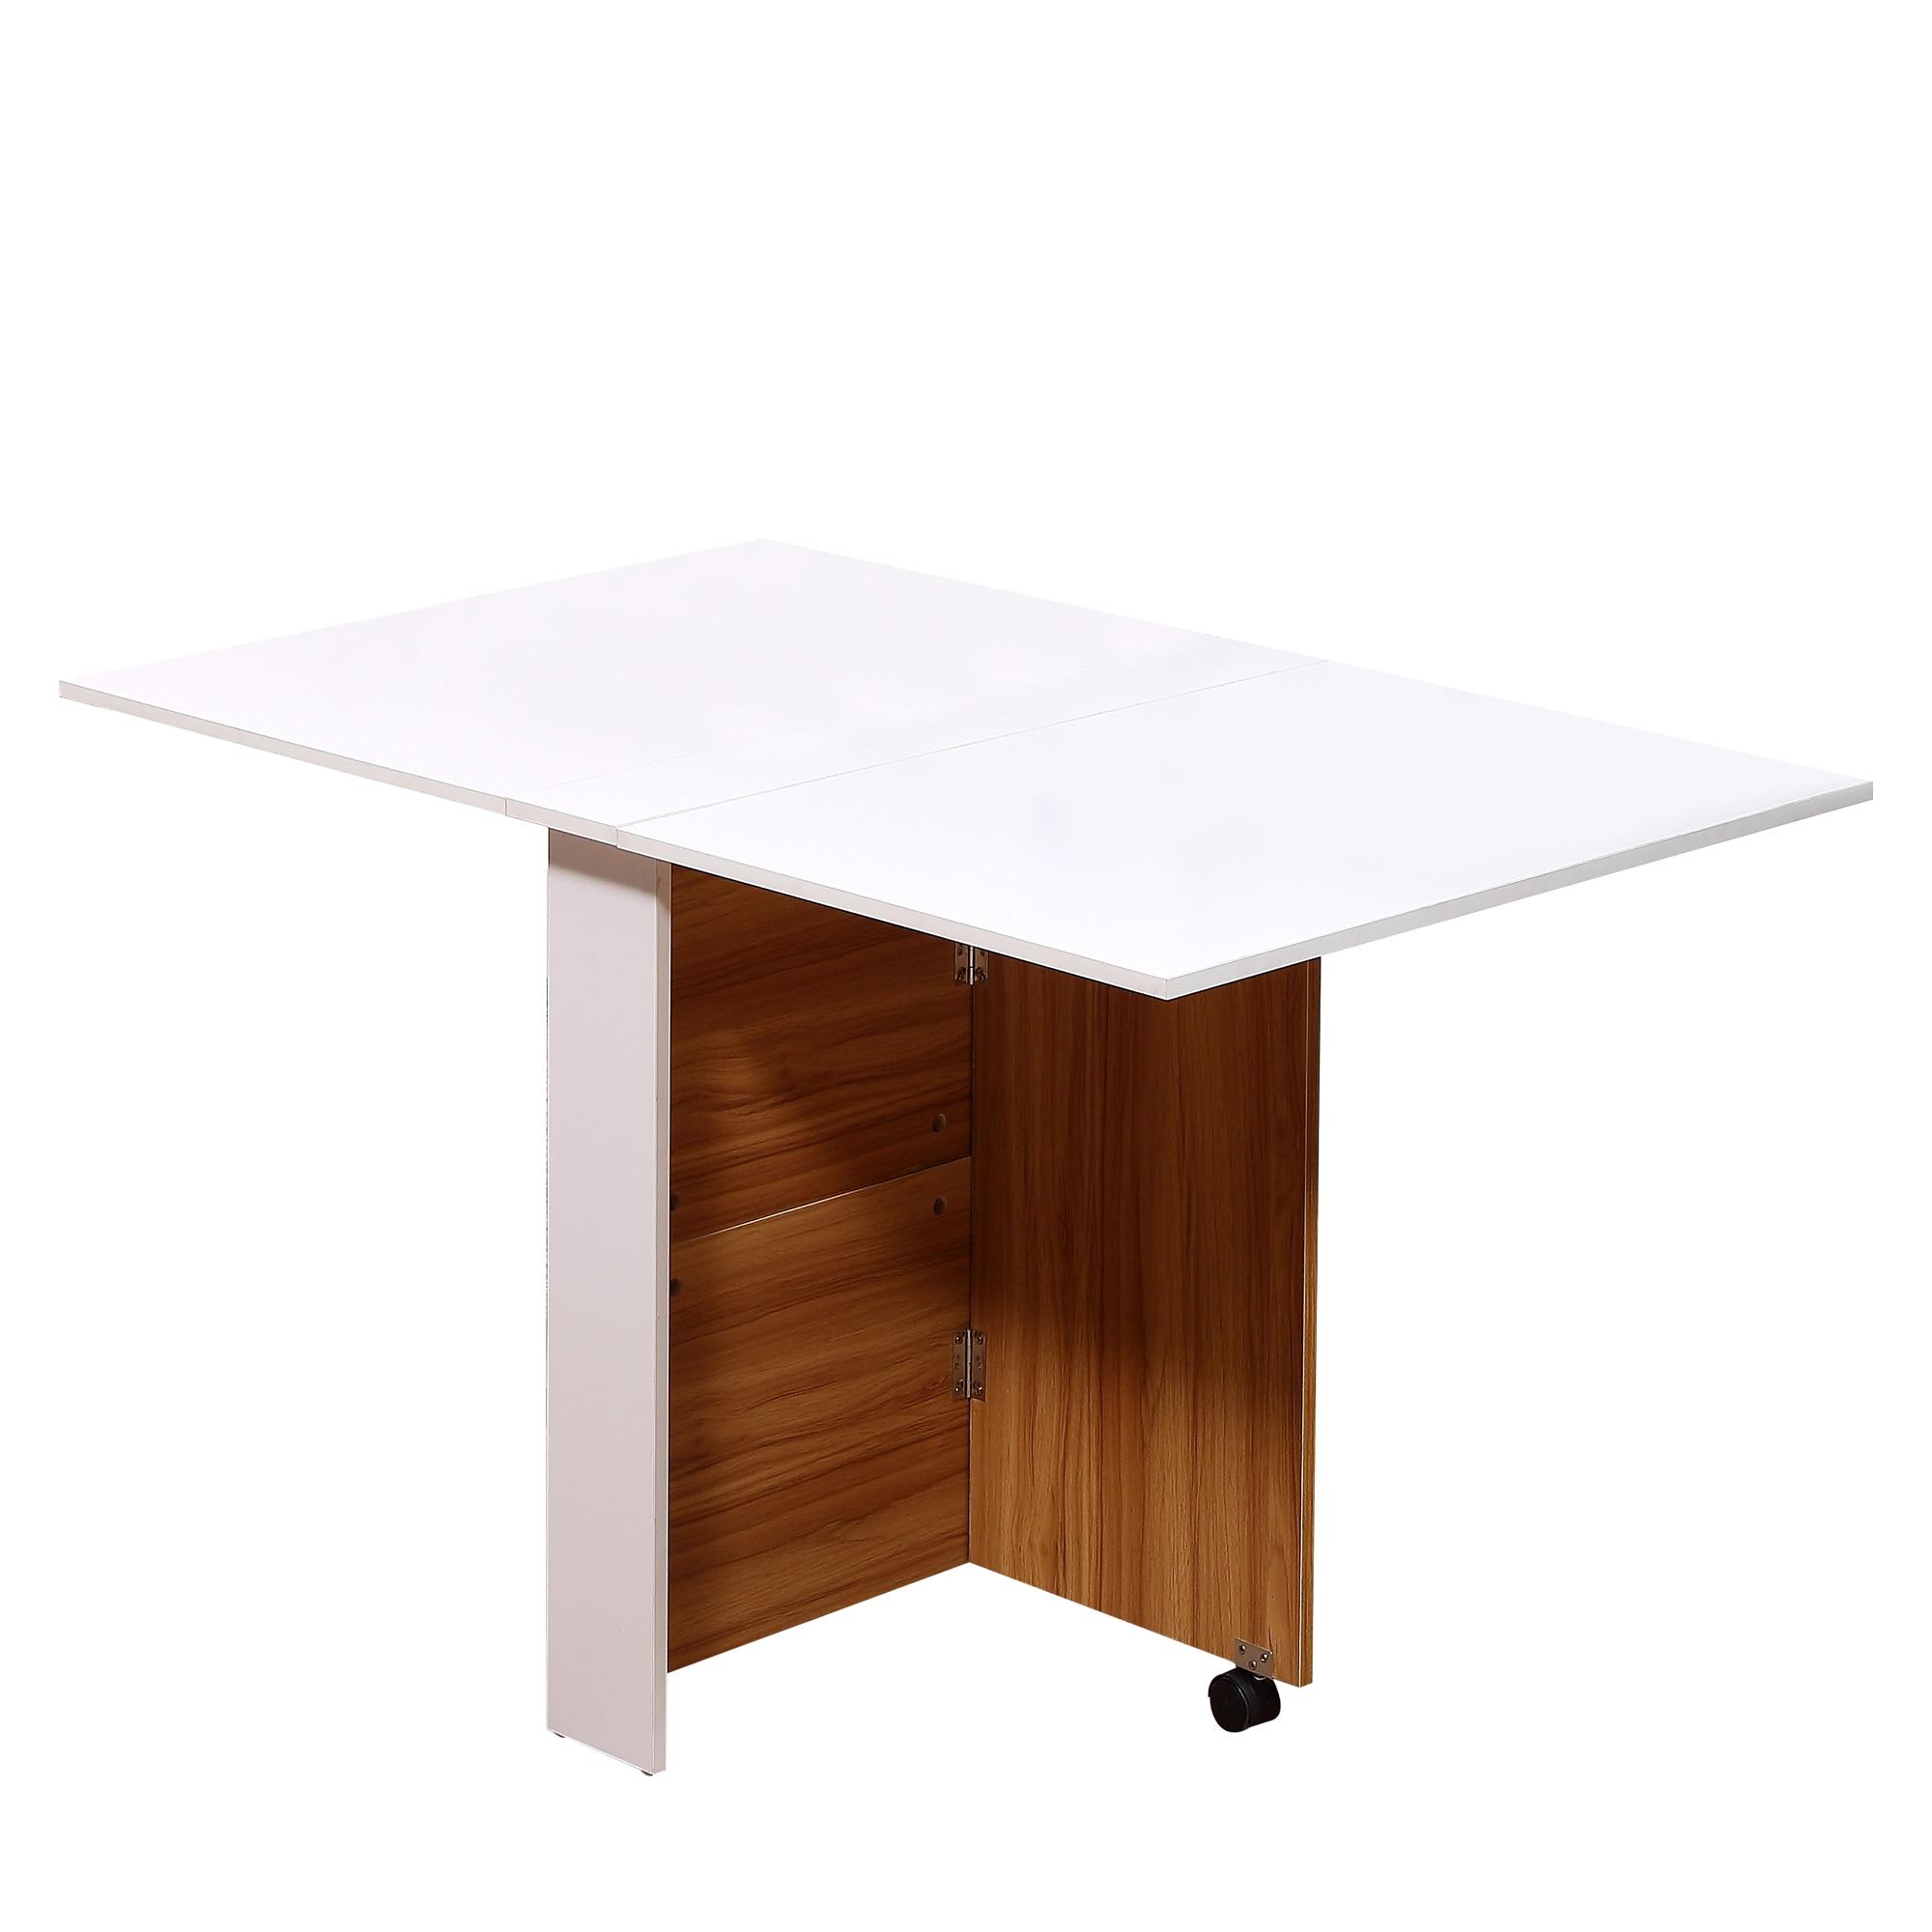 HOMCOM Dining Table Modern Design Folding Wheeled 120 × 80 × 73 Cm